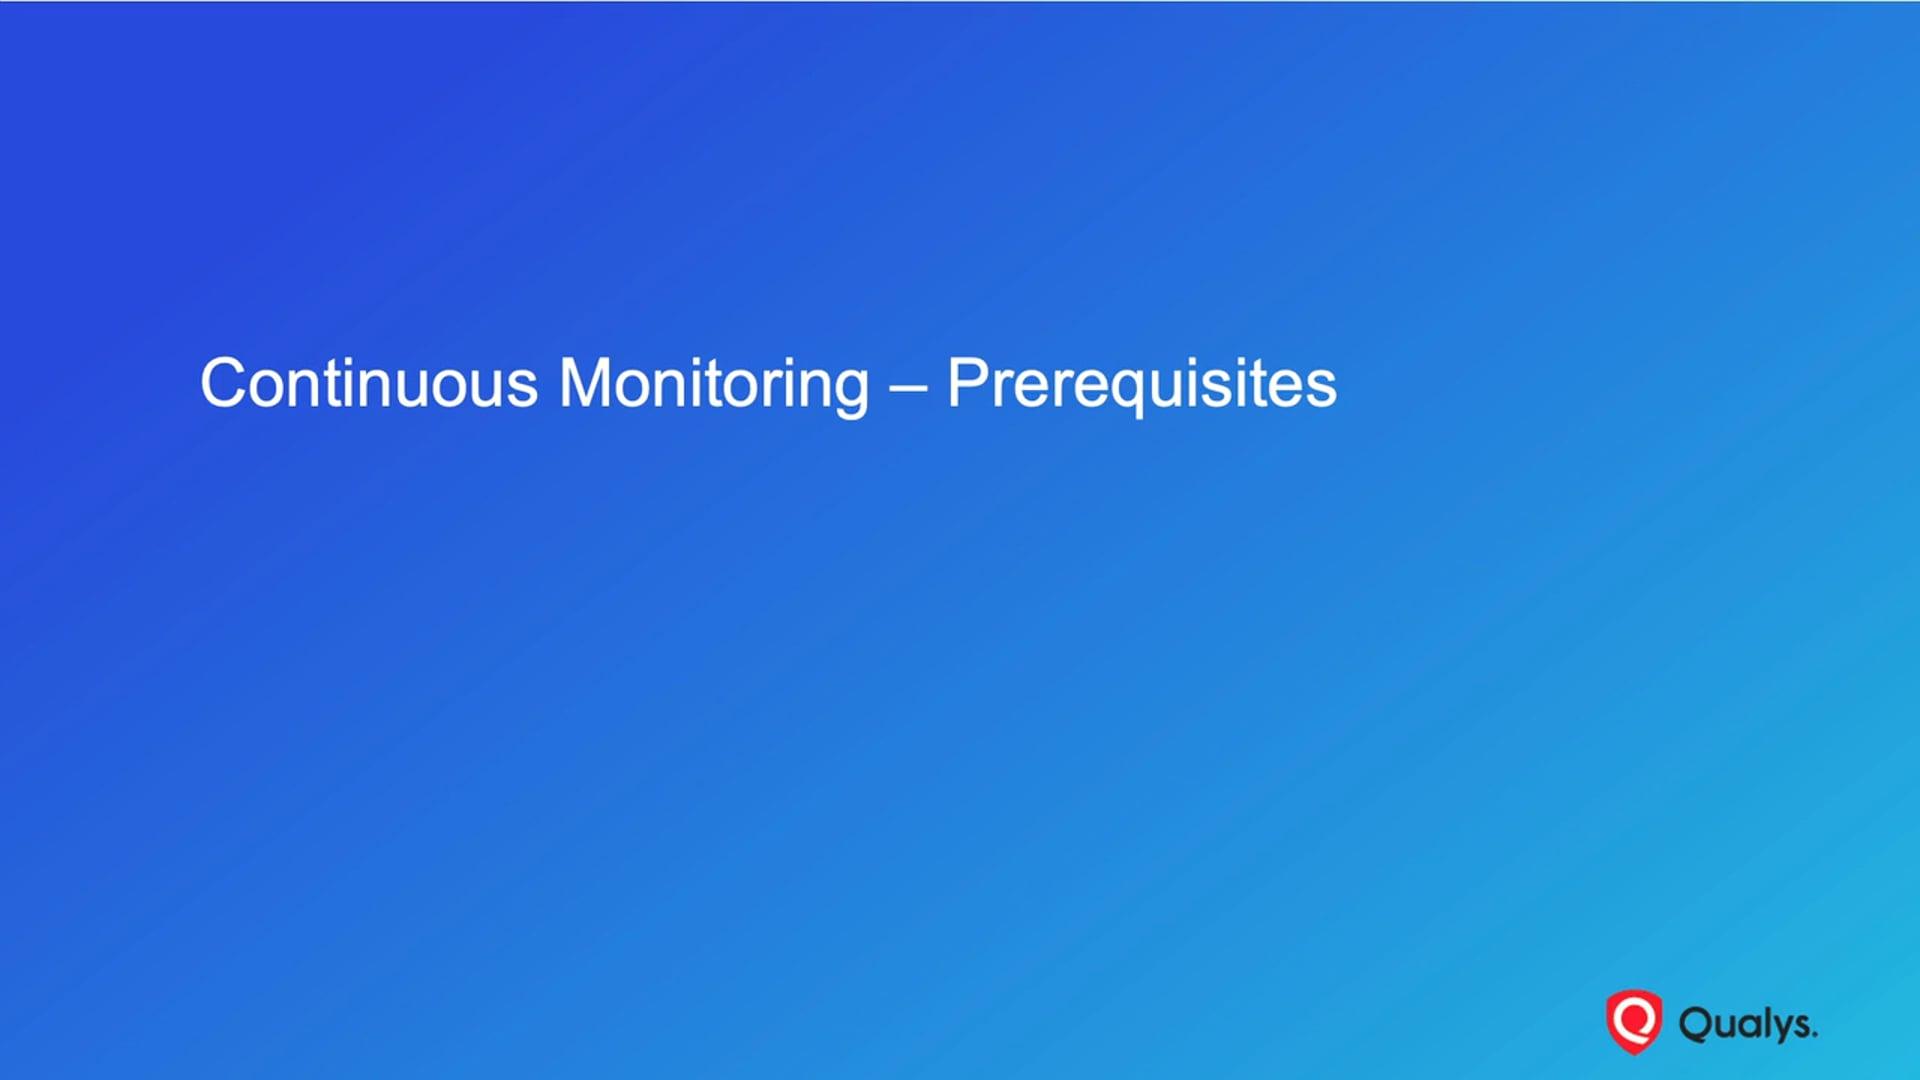 Continuous Monitoring - Prerequisites